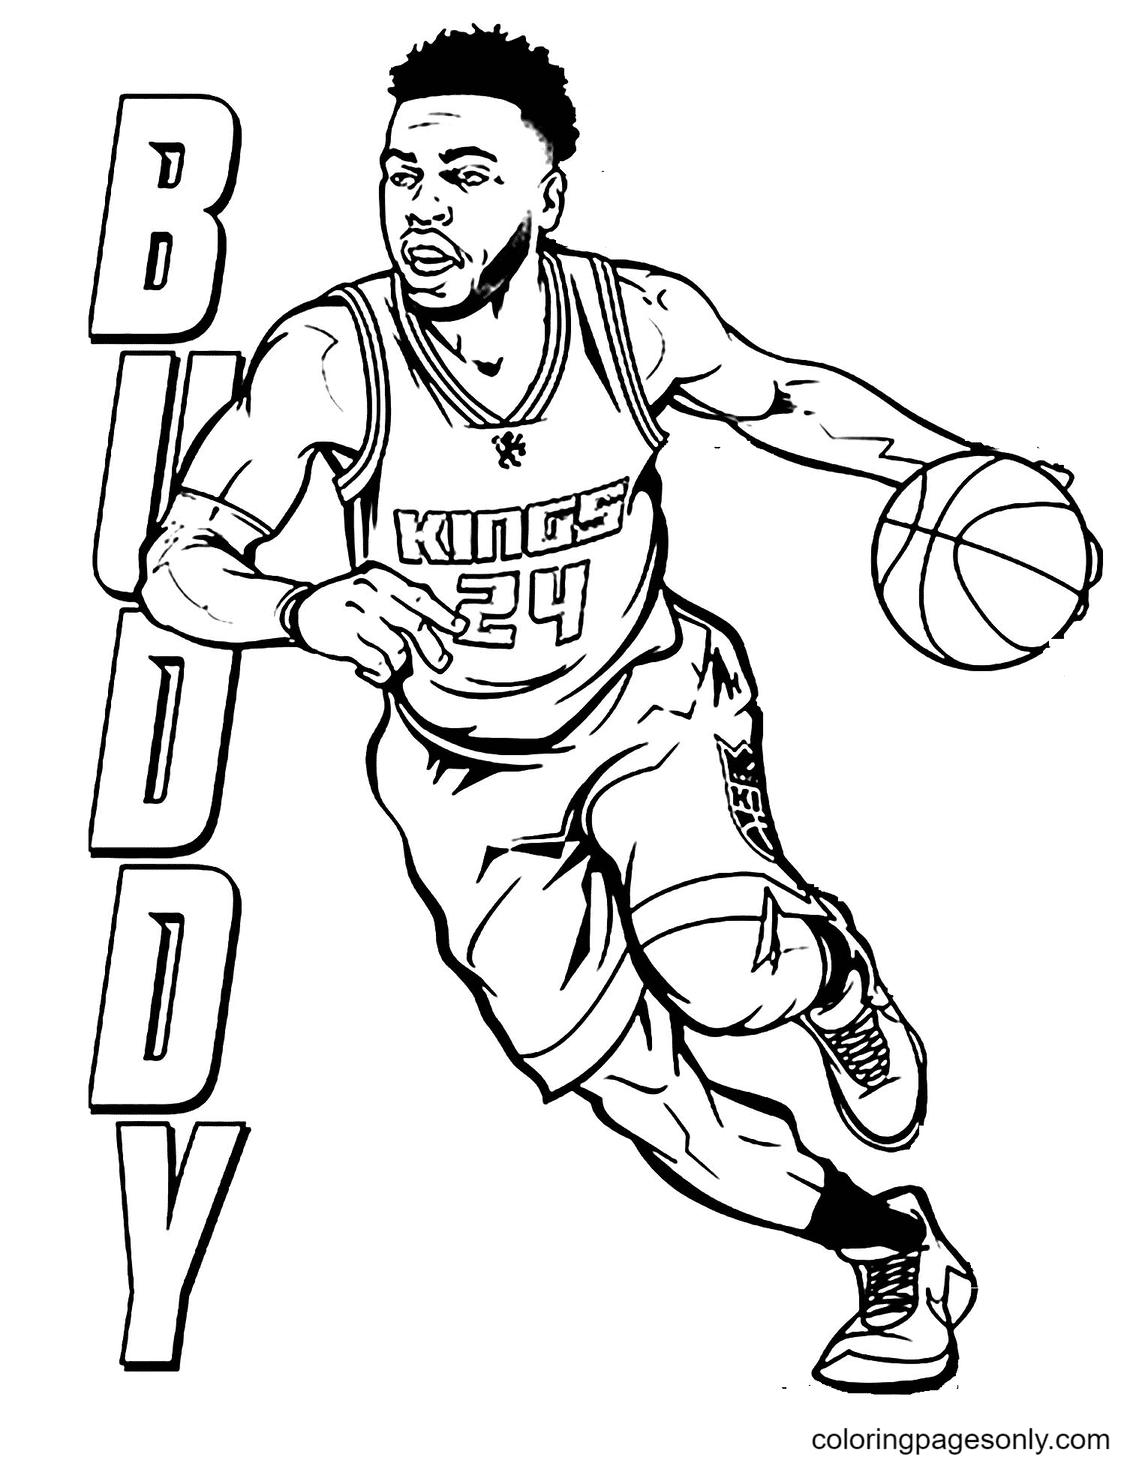 Buddy Playing Basketball Coloring Page